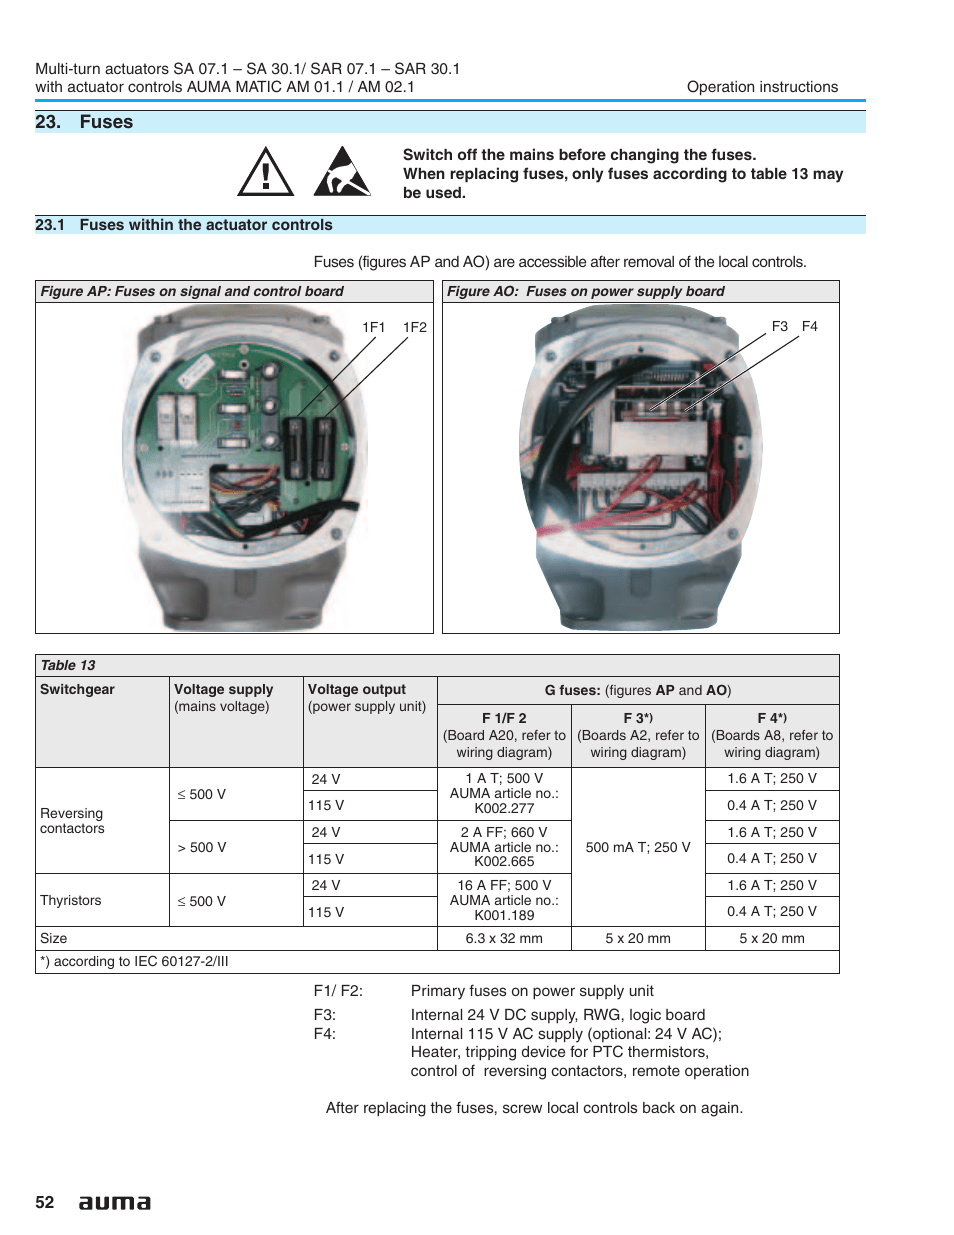 auma electric multi turn actuators sa 071 161_sar 071 161 matic am 011 021 page52?resize=665%2C861 wiring auma diagram sa07 2 2005 chevrolet hd diesel engine bettis actuator wiring diagrams at sewacar.co